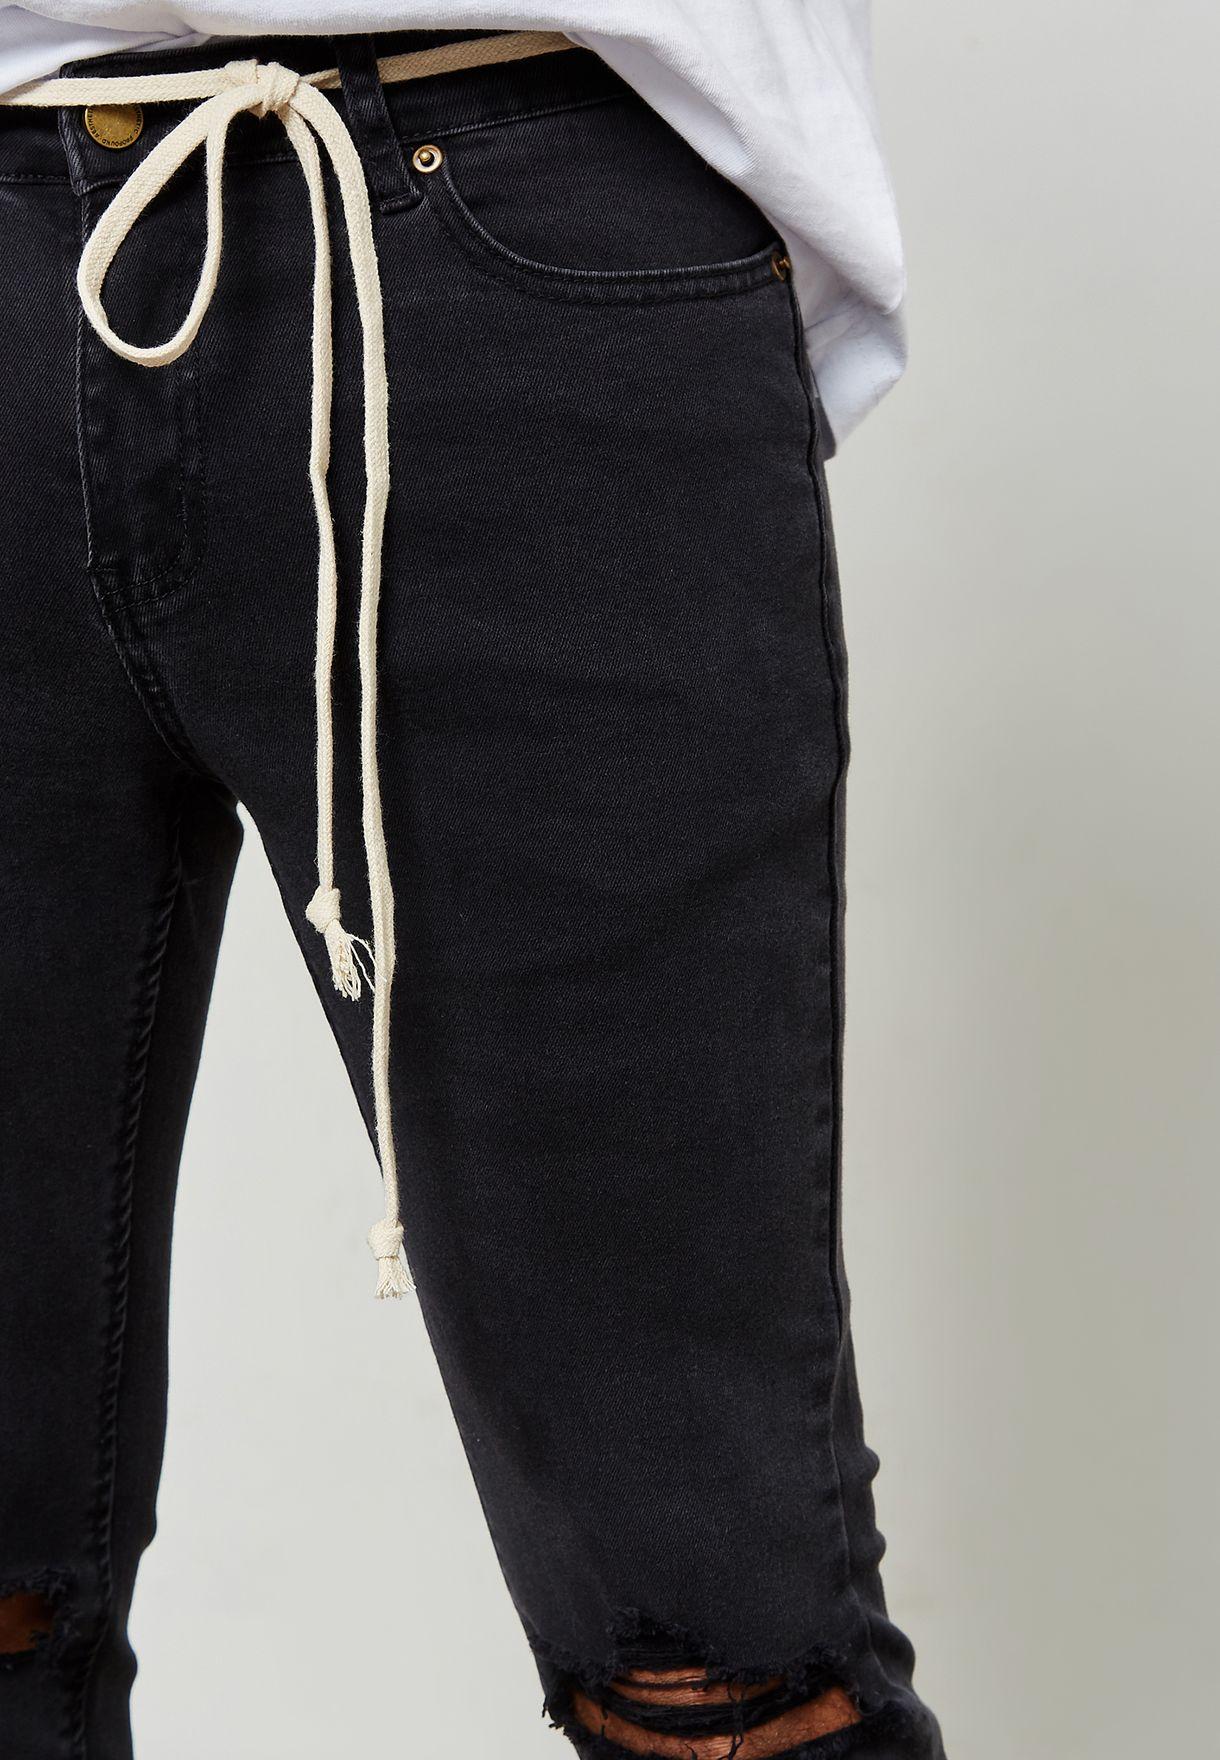 جينز باهت وممزق